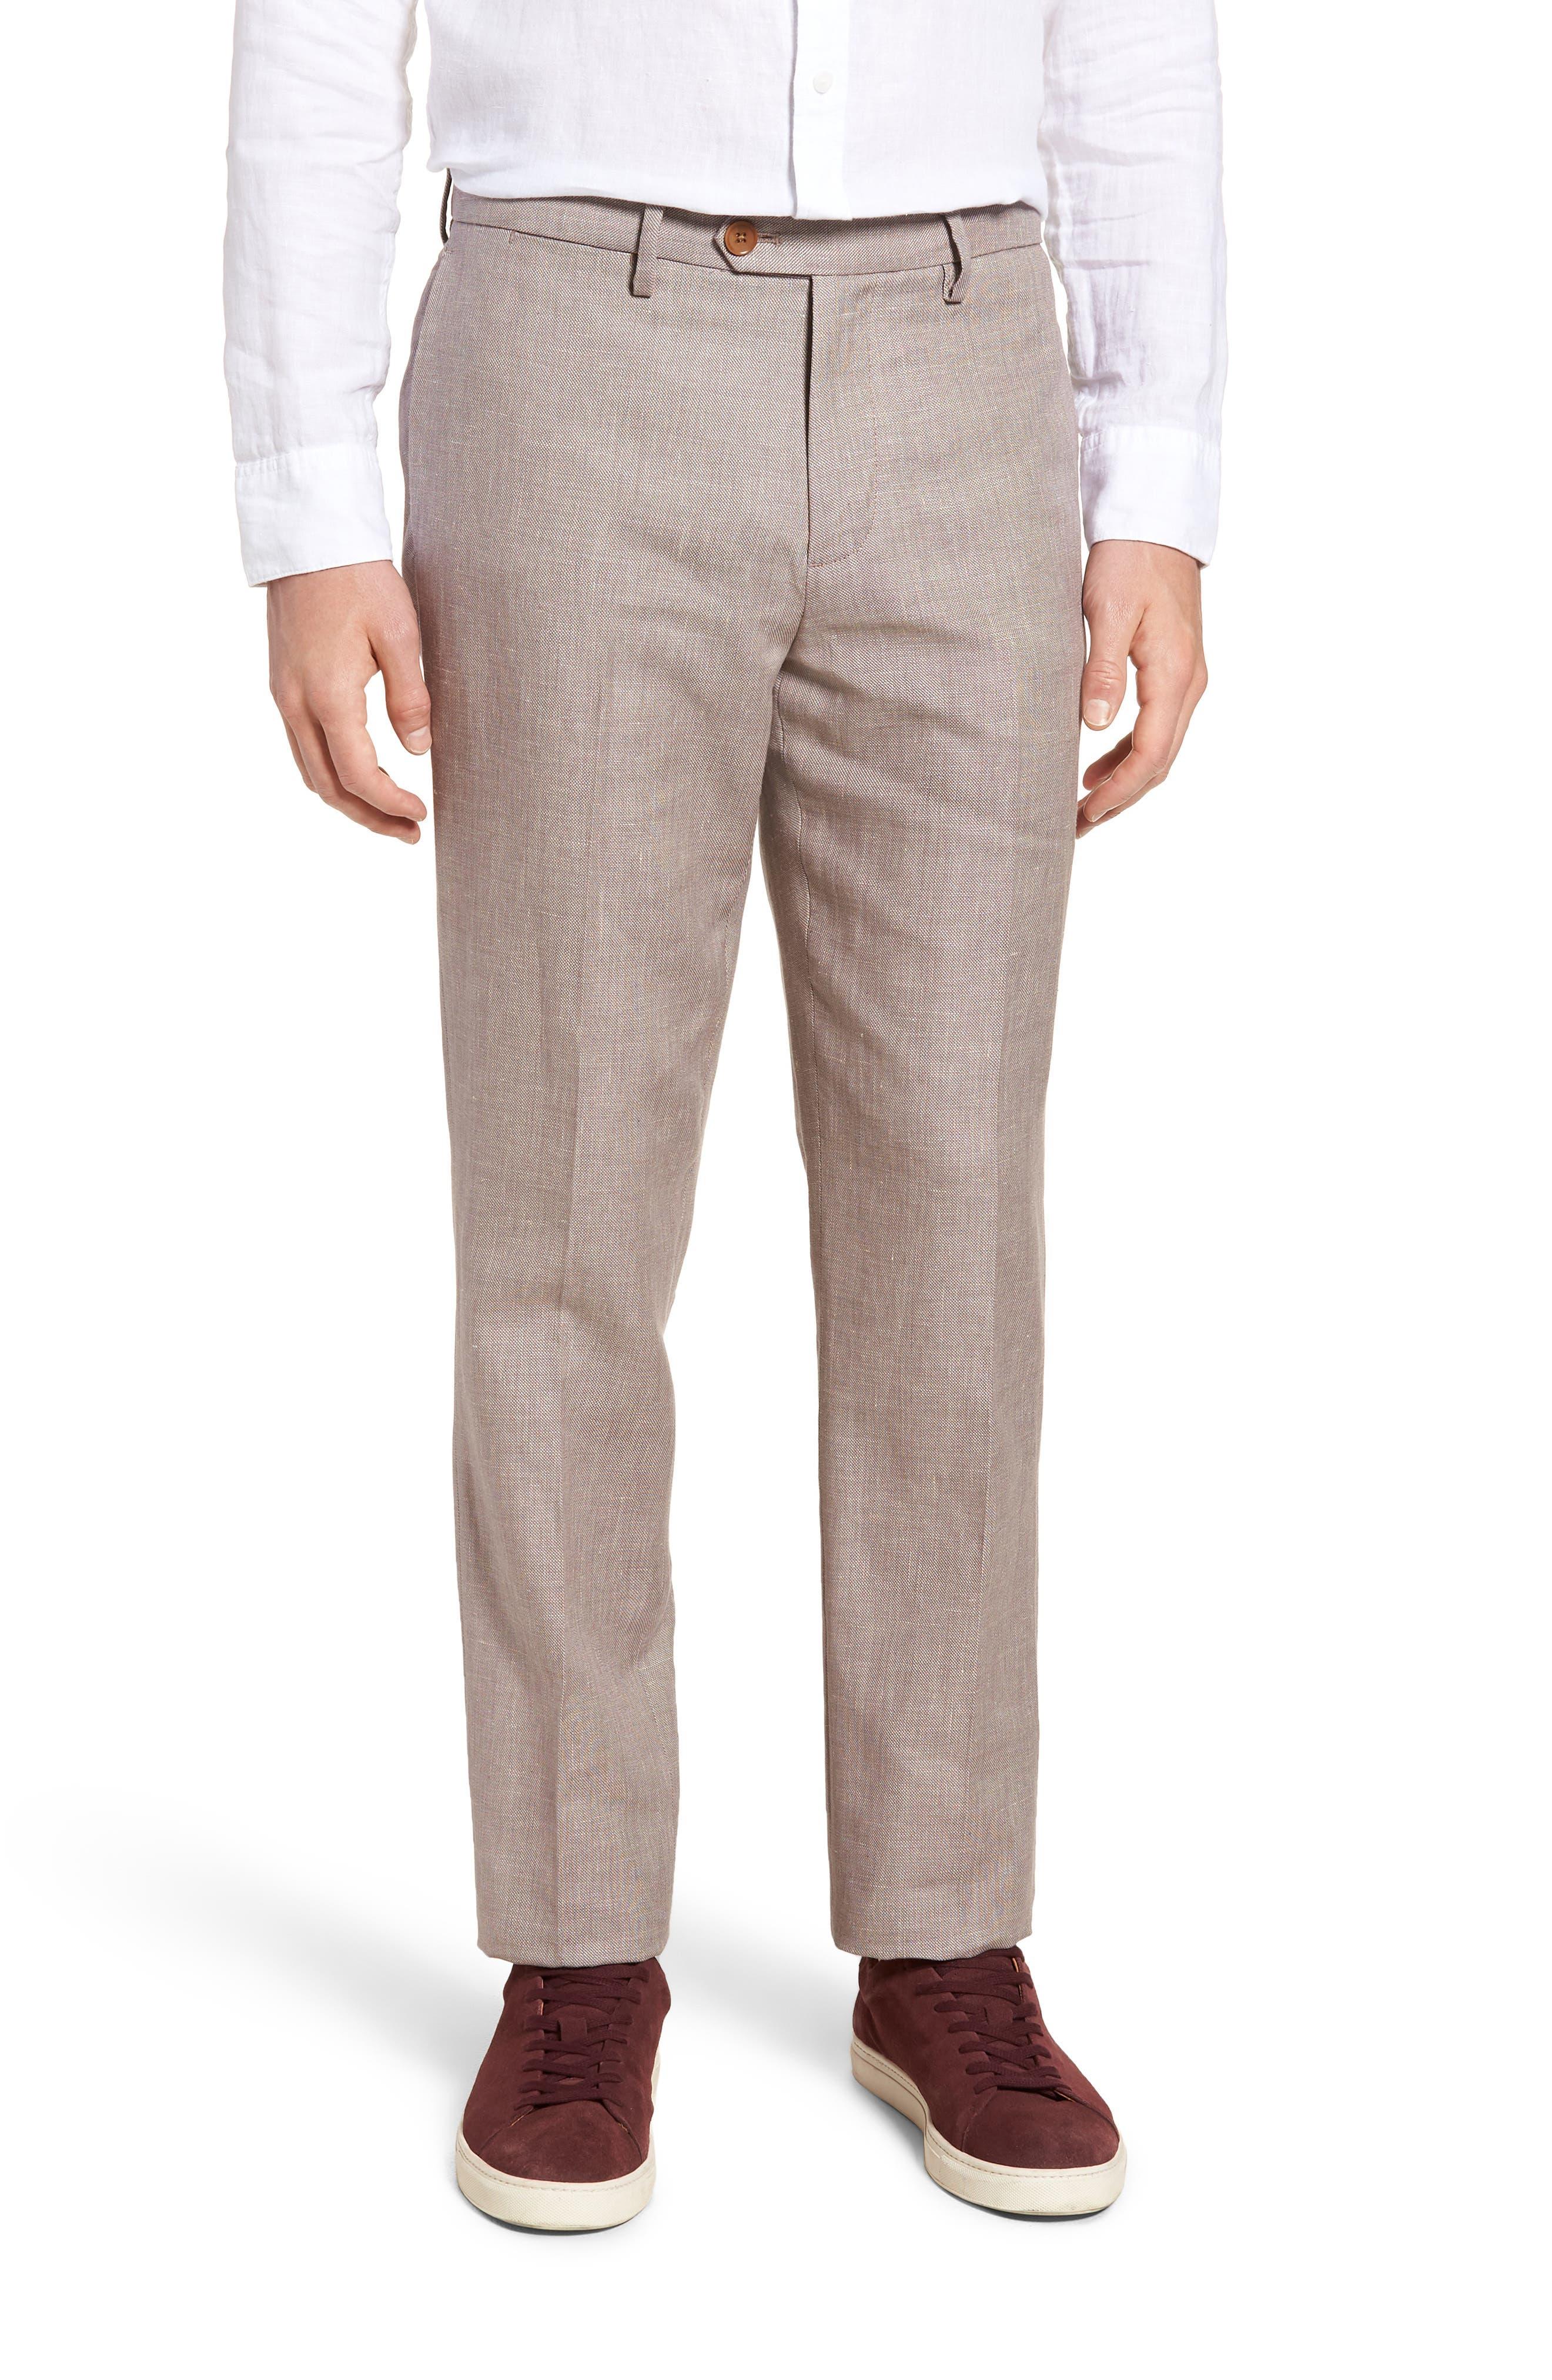 Flat Front Solid Stretch Cotton & Linen Pants,                             Main thumbnail 1, color,                             Brown